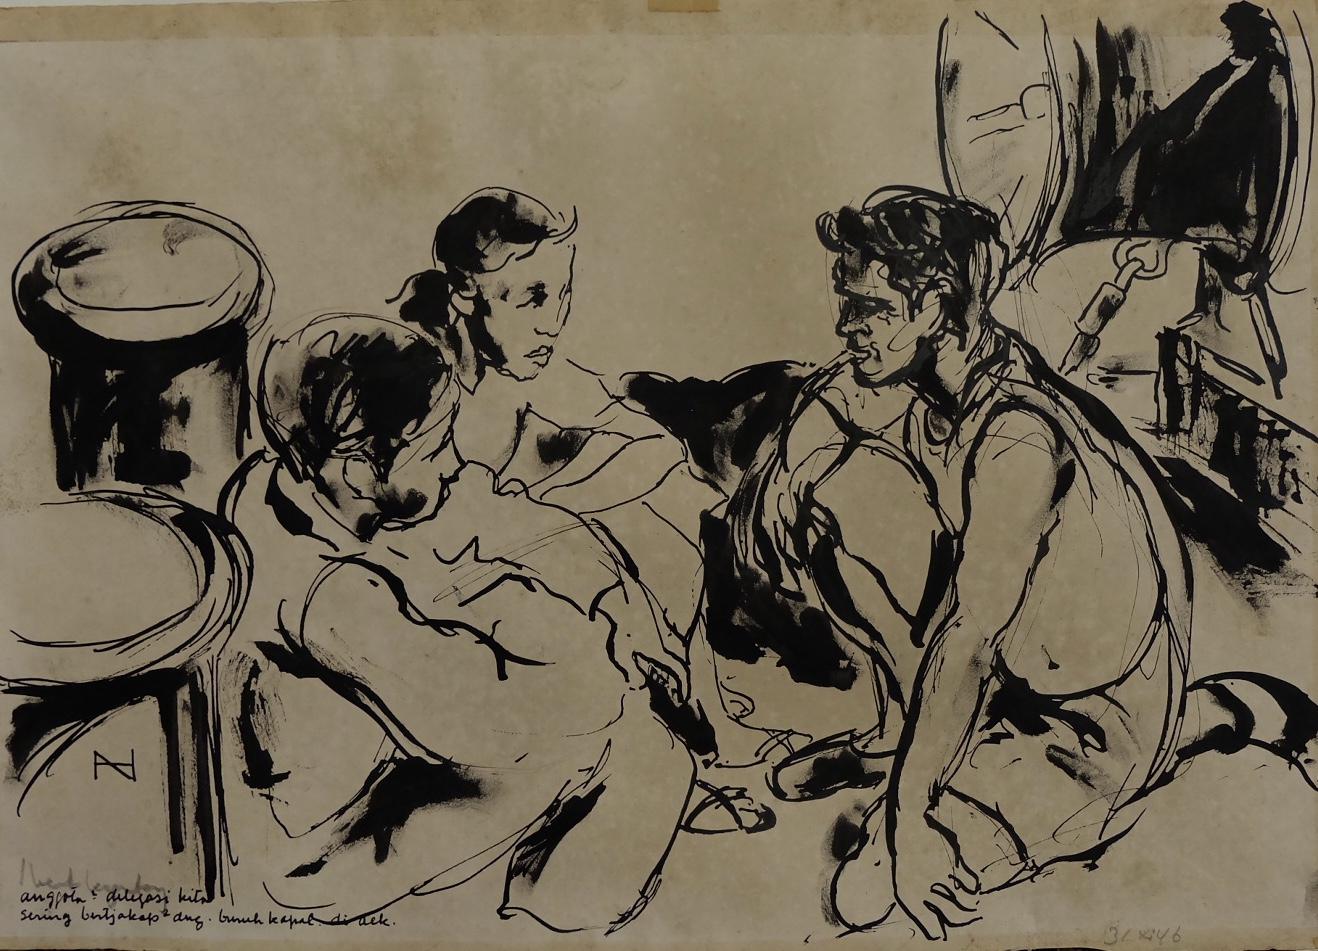 Artist: Henk Ngantung, b.1921 (Indonesia)    Title: Di Atas Kapal Renville Medium: ink on paper   Dimension: 35 cm x 40 cm Year: 1946